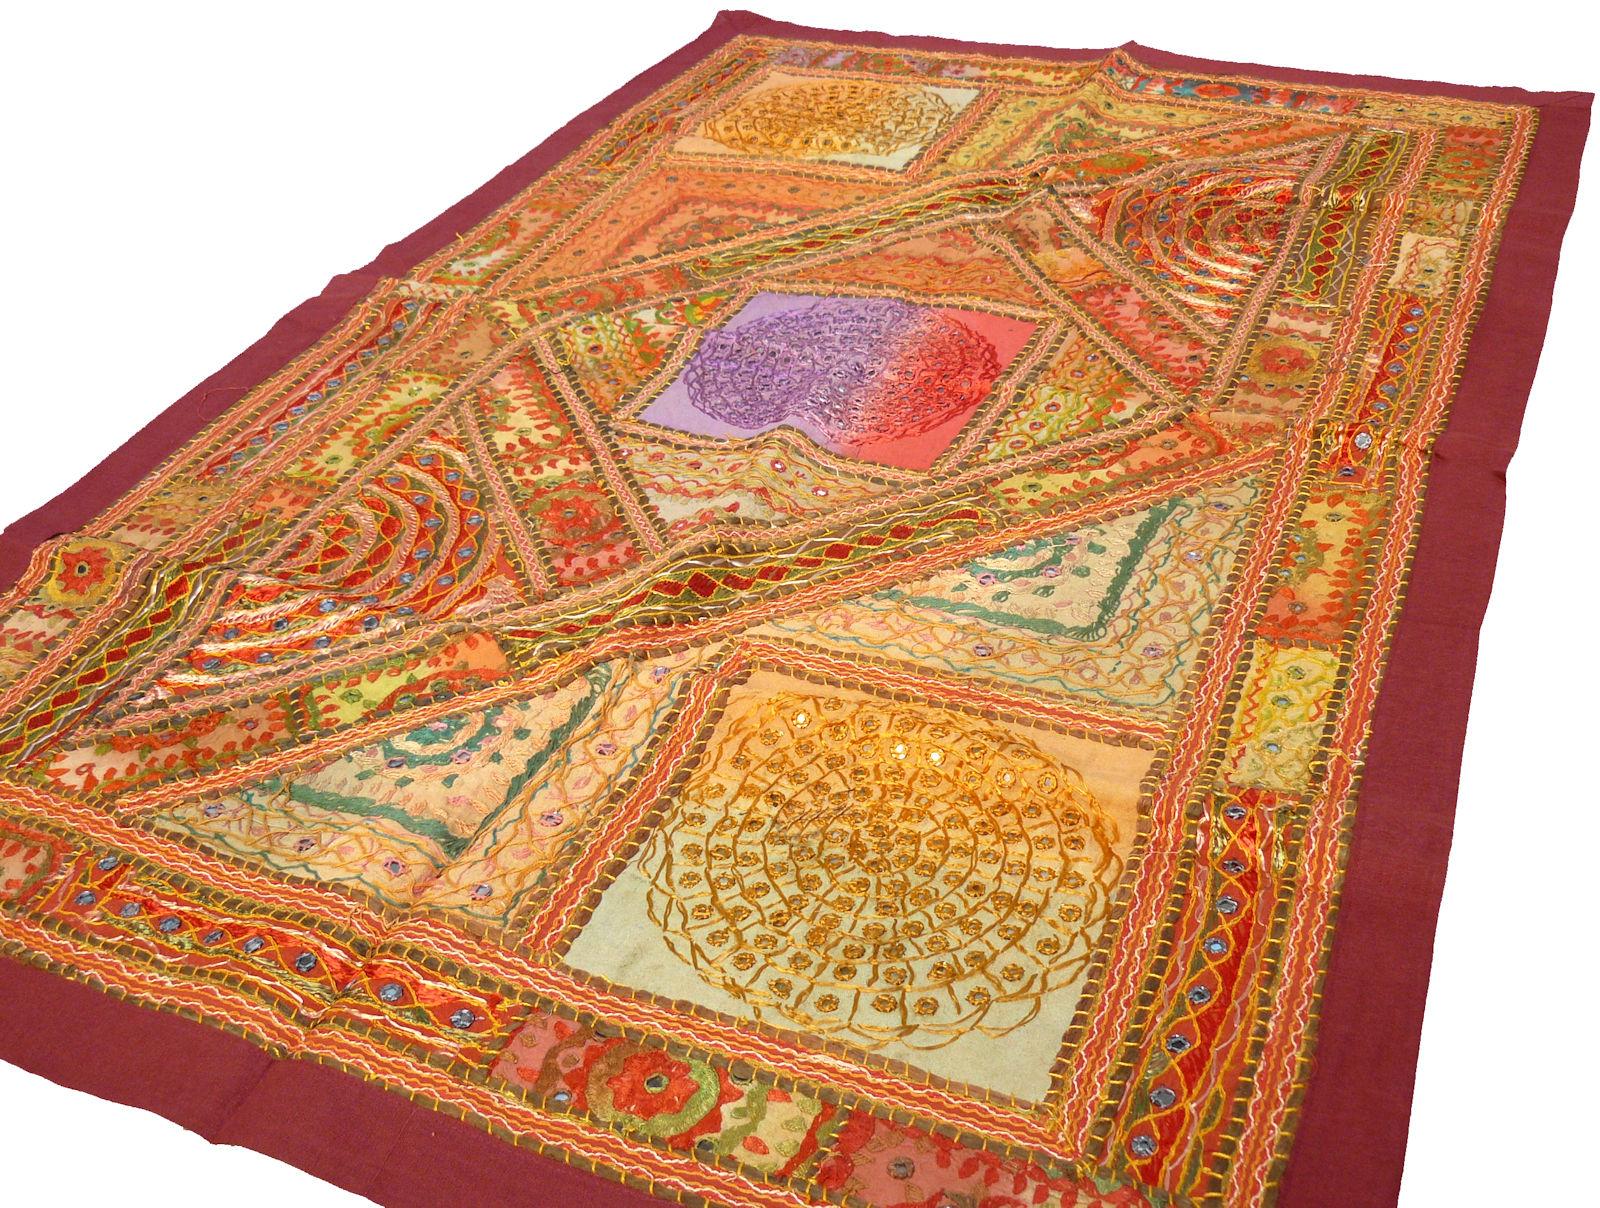 wandbehang wandteppich indien patchwork ethno wandschmuck asien orient unikat ebay. Black Bedroom Furniture Sets. Home Design Ideas